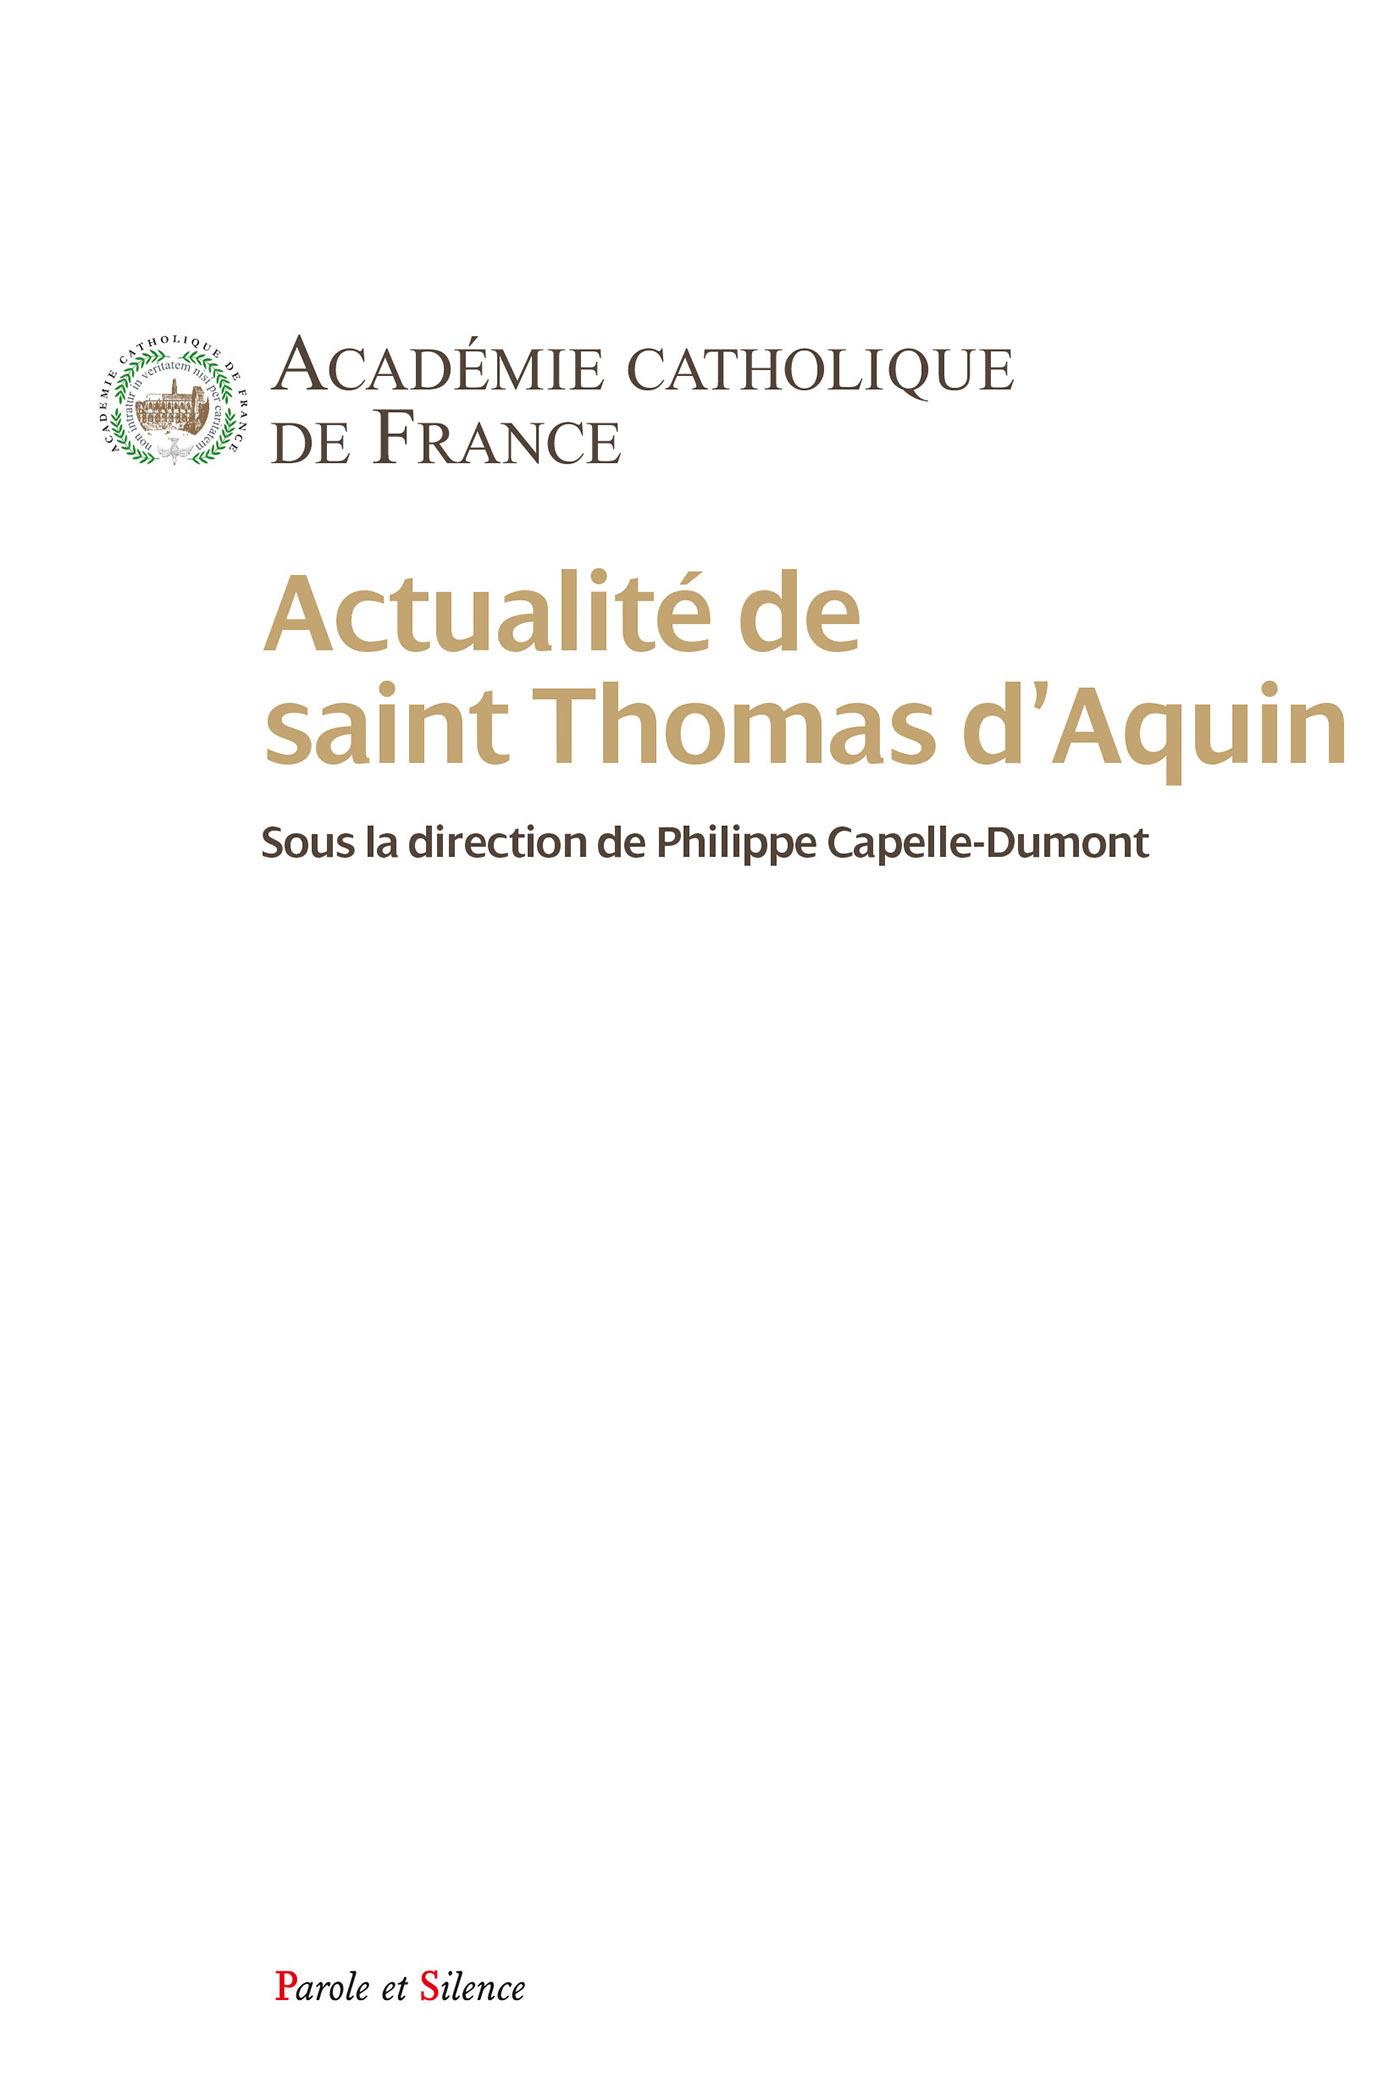 ACTUALITE DE SAINT THOMAS D'AQUIN